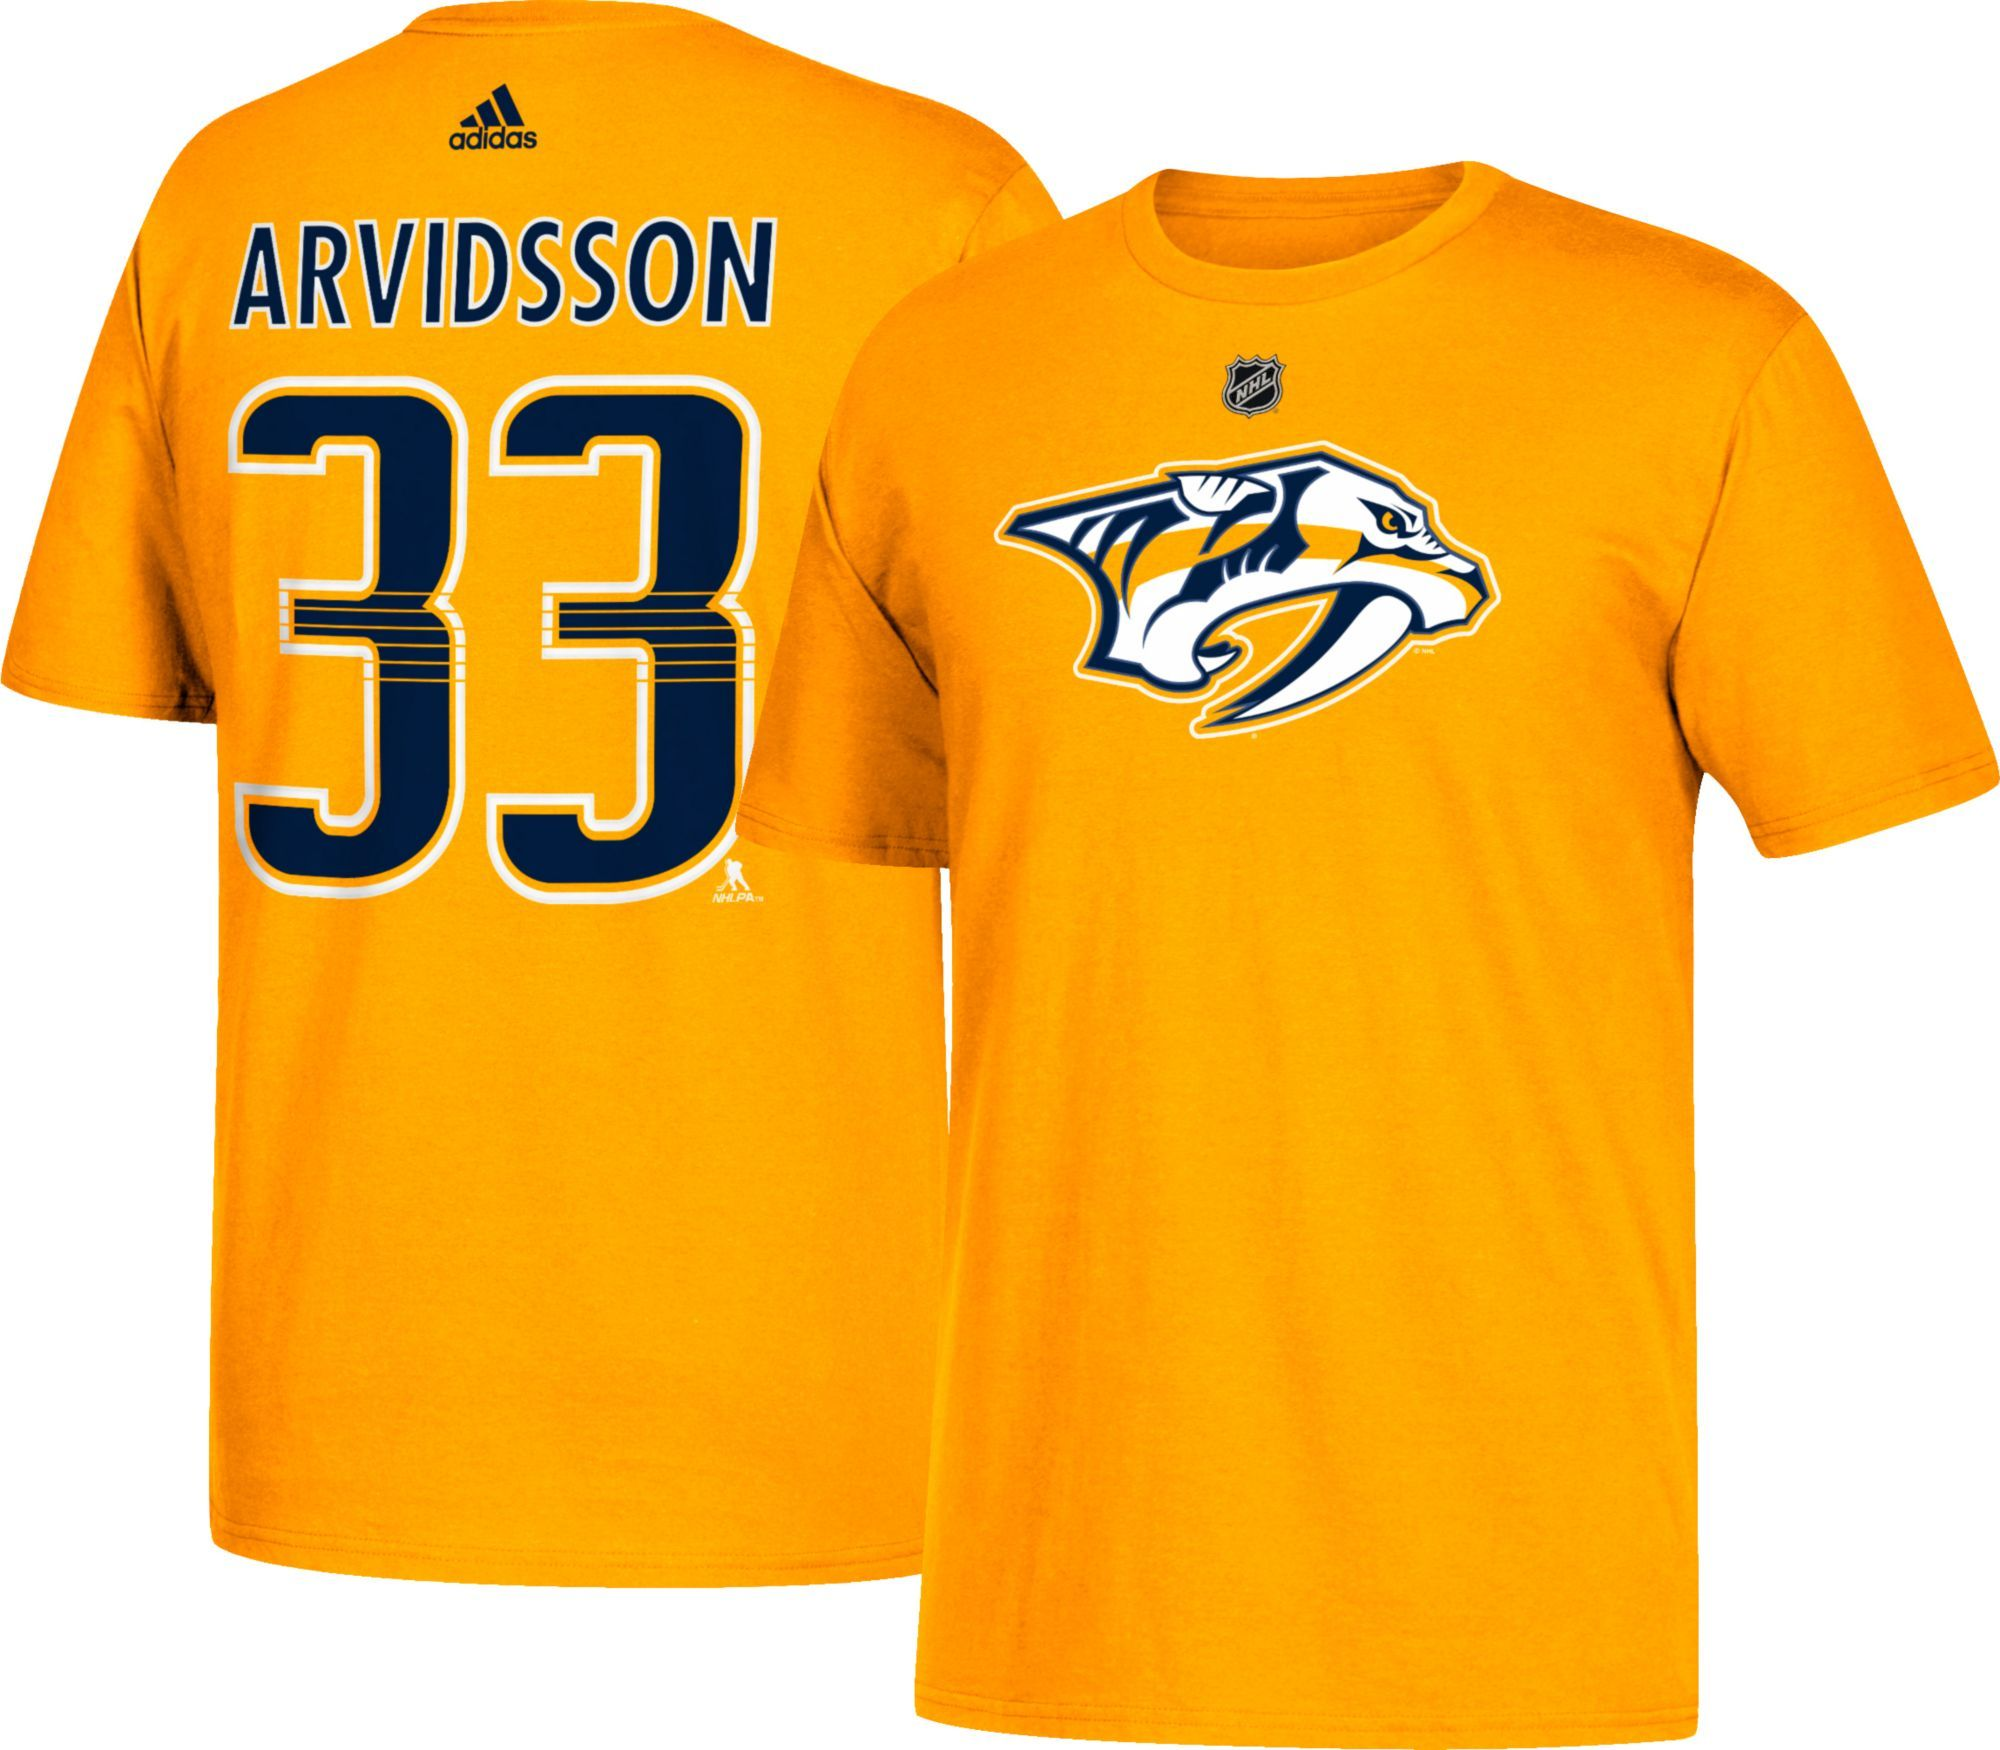 check out 81474 5263d adidas Men's Nashville Predators Viktor Arvidsson #38 Gold T ...